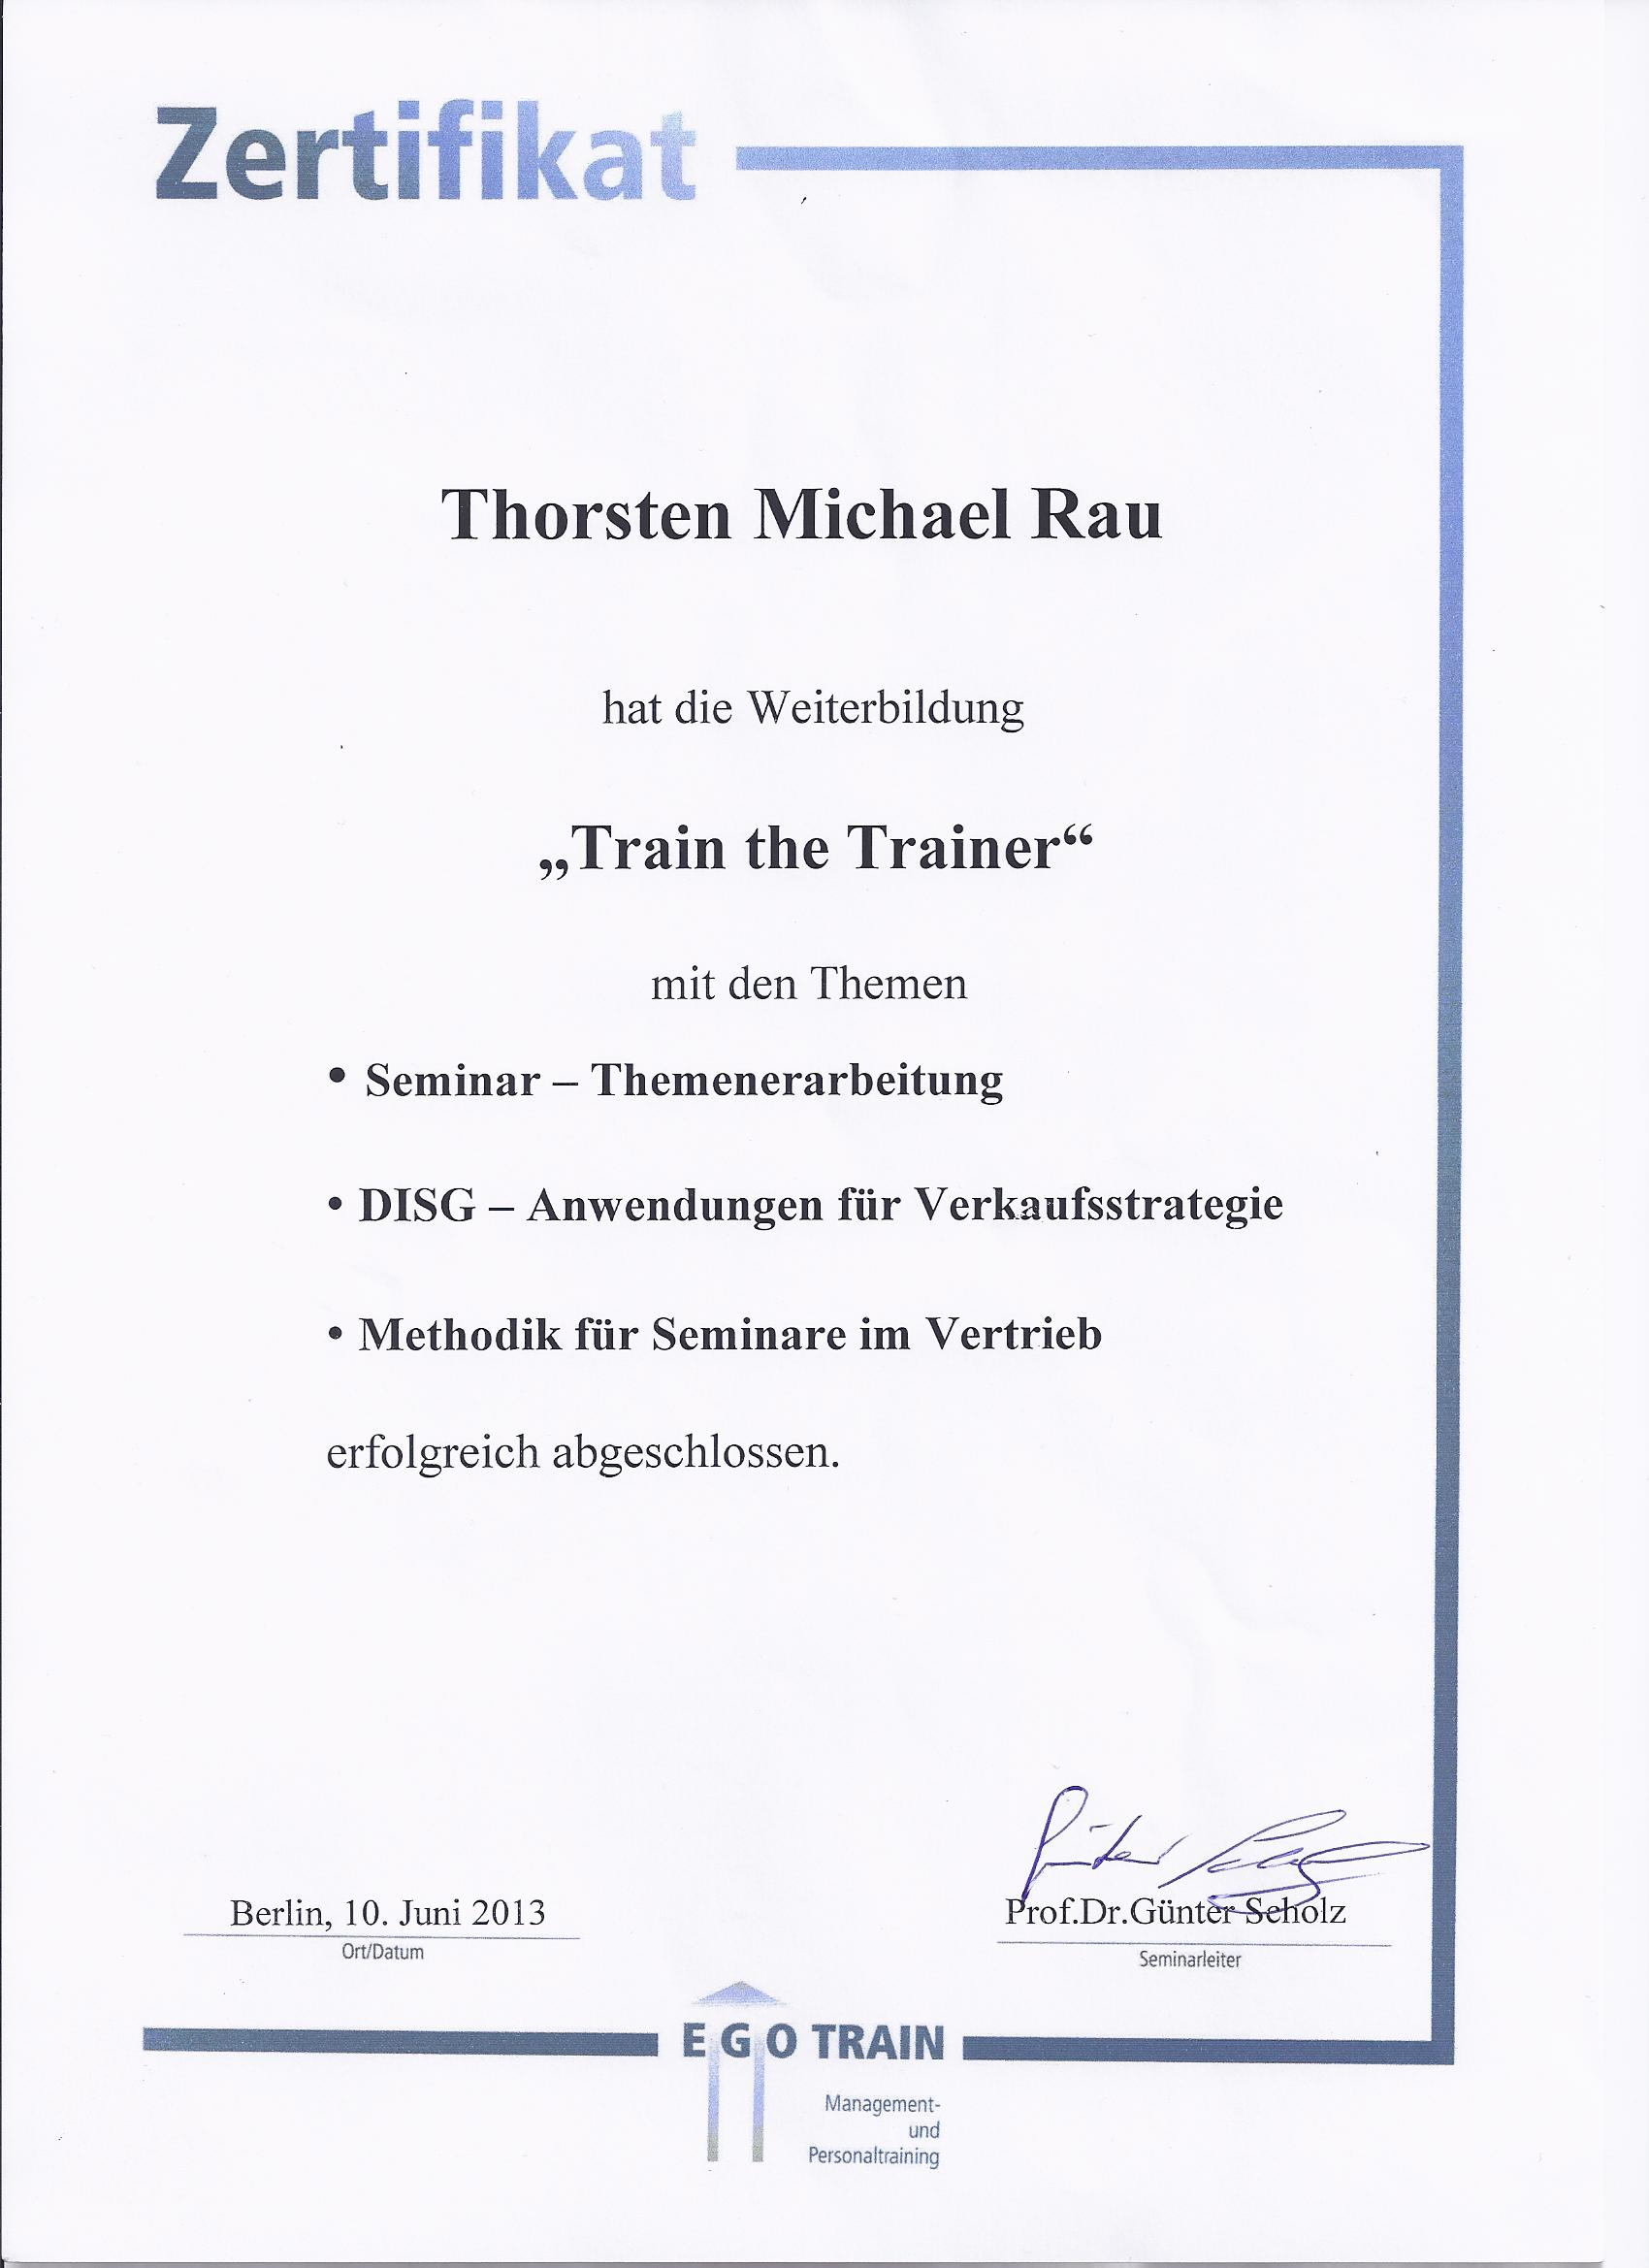 Train The Trainer Zertifikat 2013 Team Rau Seminare